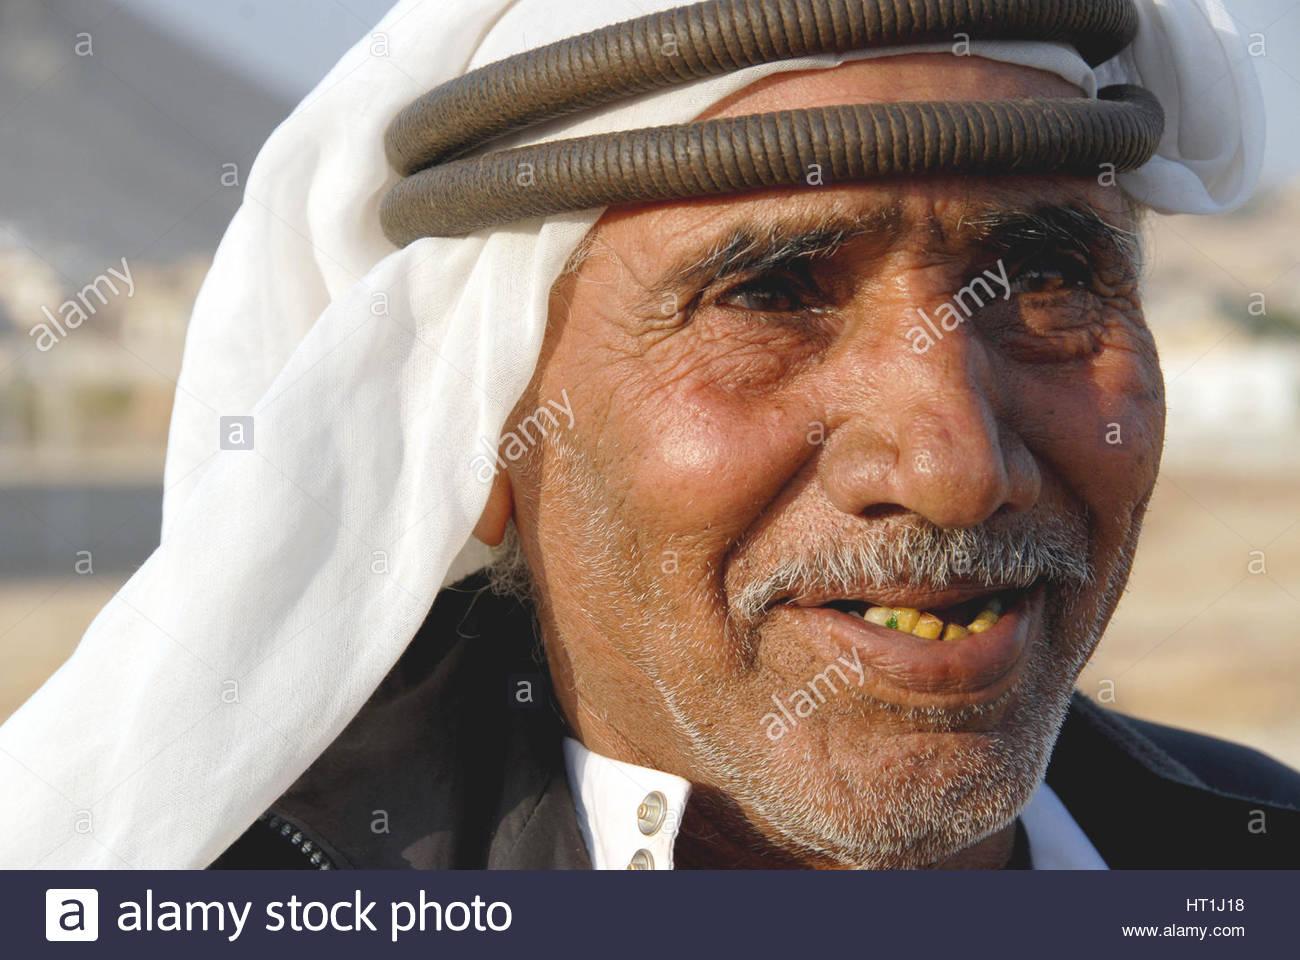 A Bedouin Palestinian - Jericho - West Bank    Credit ©  Livio Senigalliesi/Sintesi /Alamy Stock Photo - Stock Image